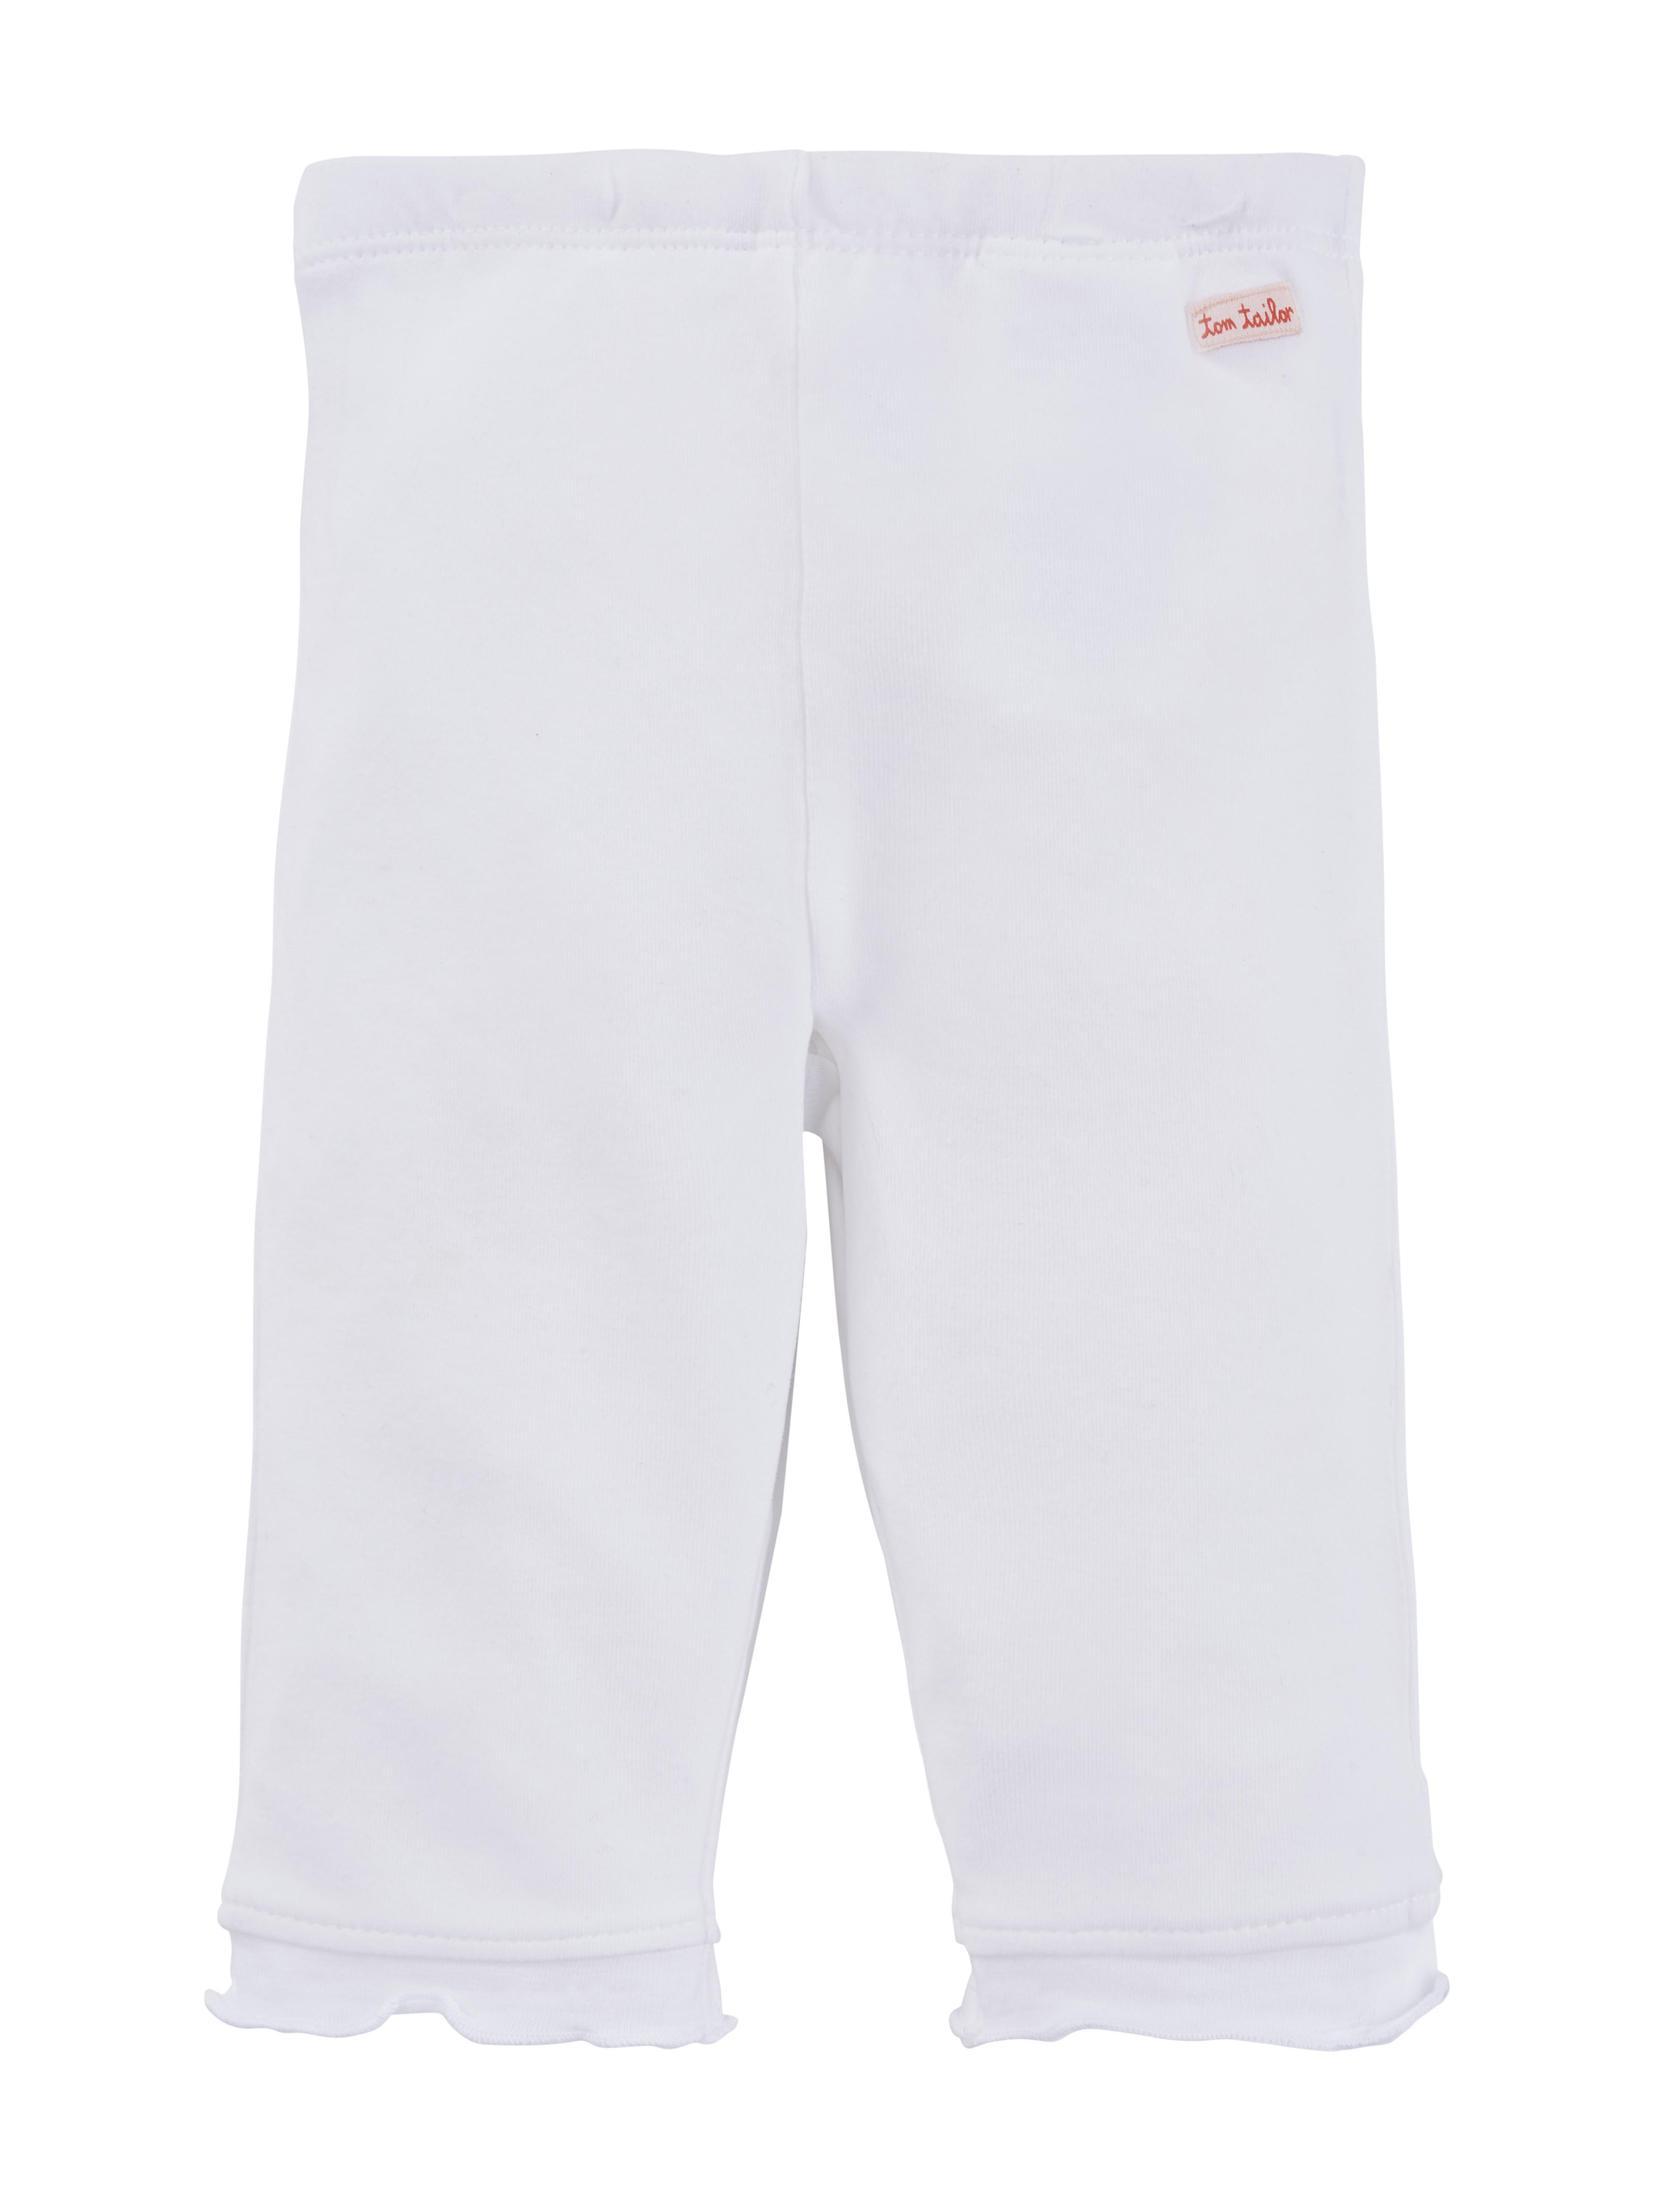 leggings solid, bright white-white